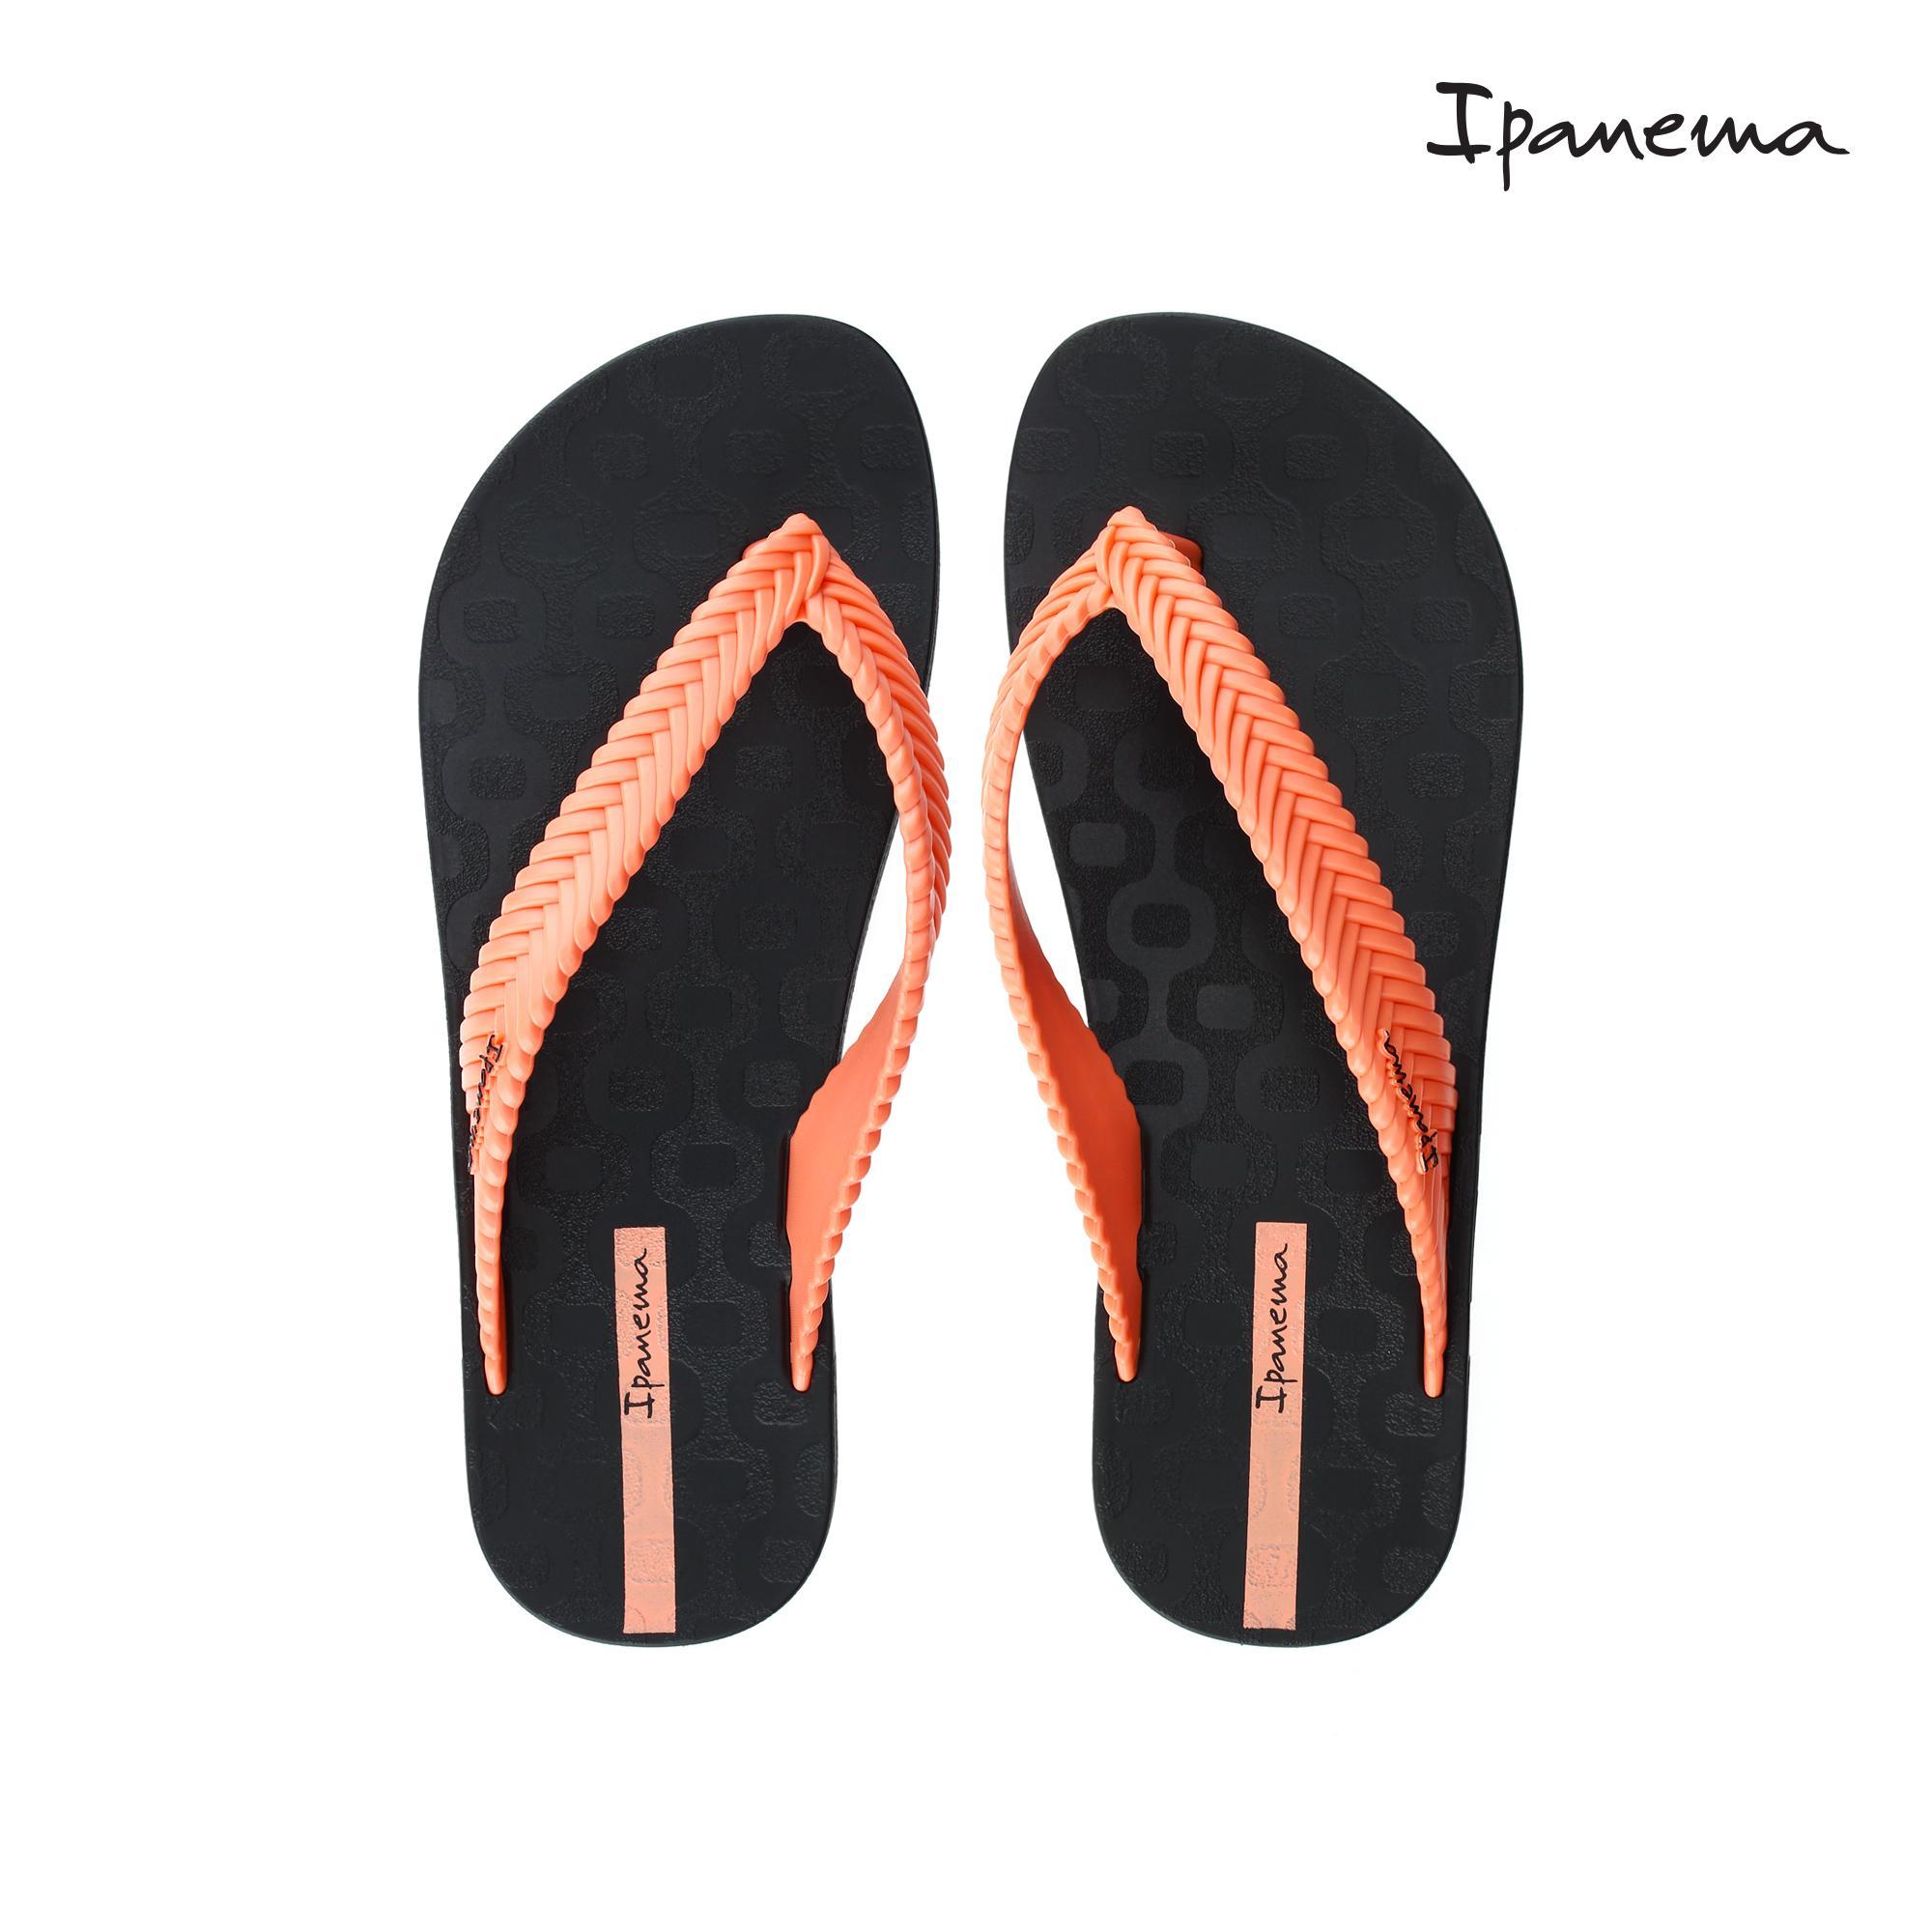 19ad418a5a4 Ipanema Philippines  Ipanema price list - Ipanema Flip Flop   Sandals for  sale